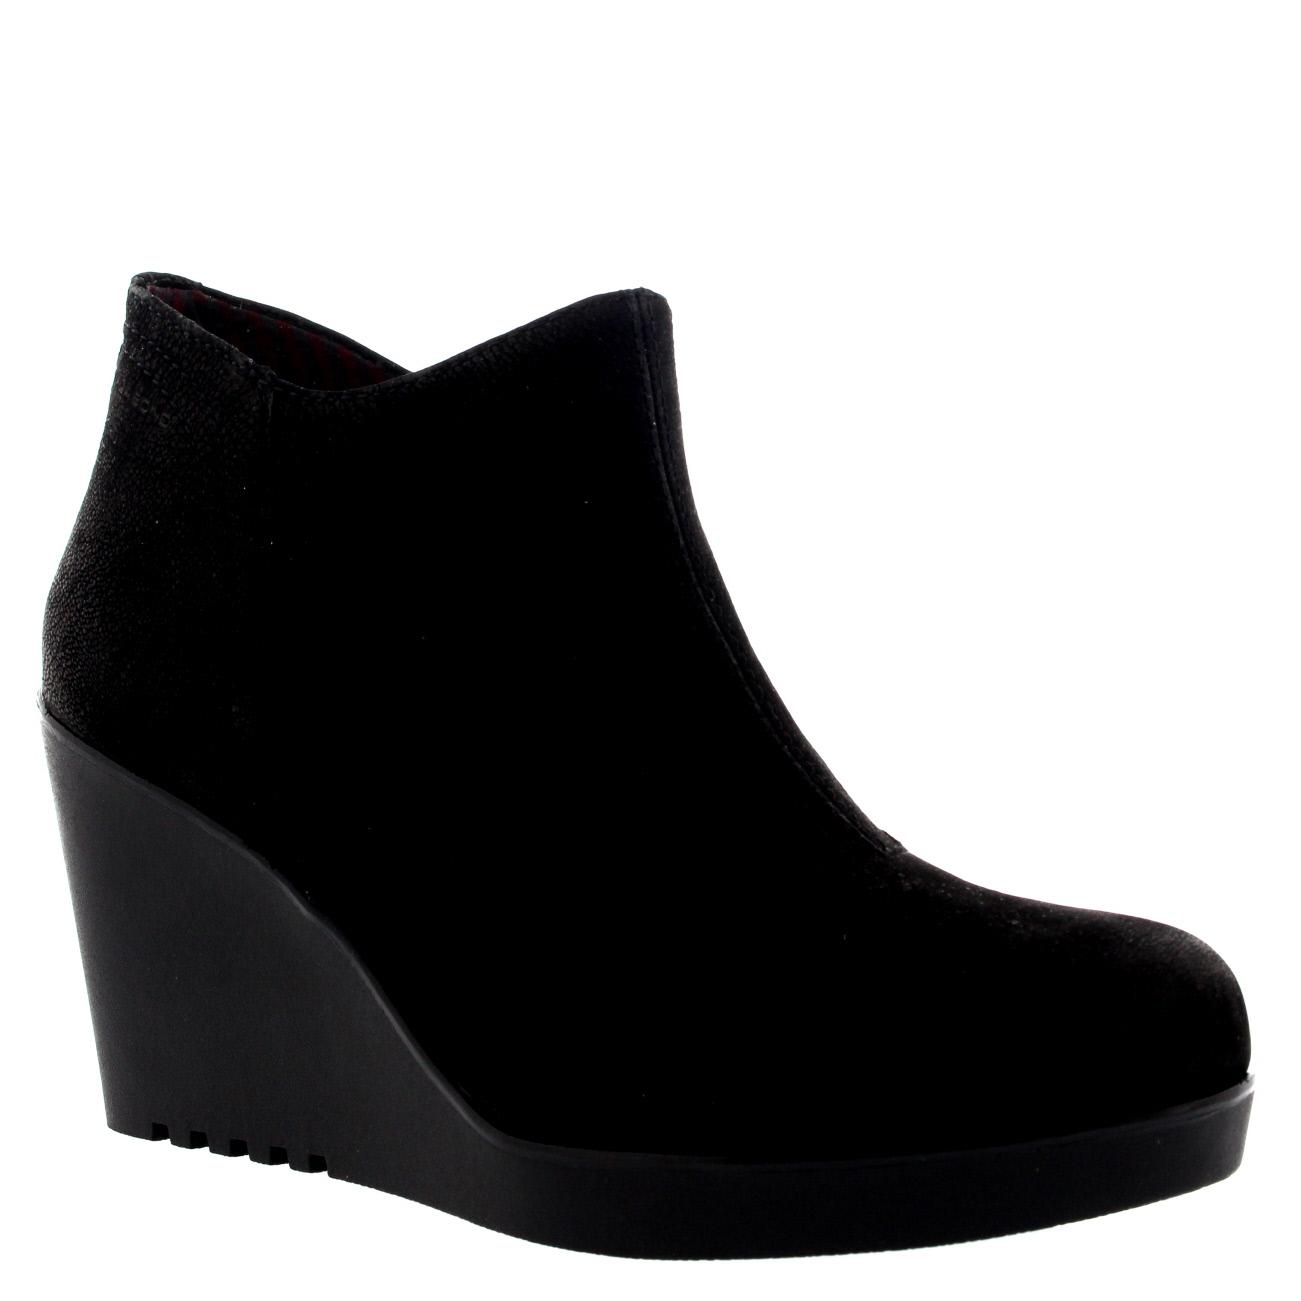 Vagabond Valencia Wedge Heel Boots